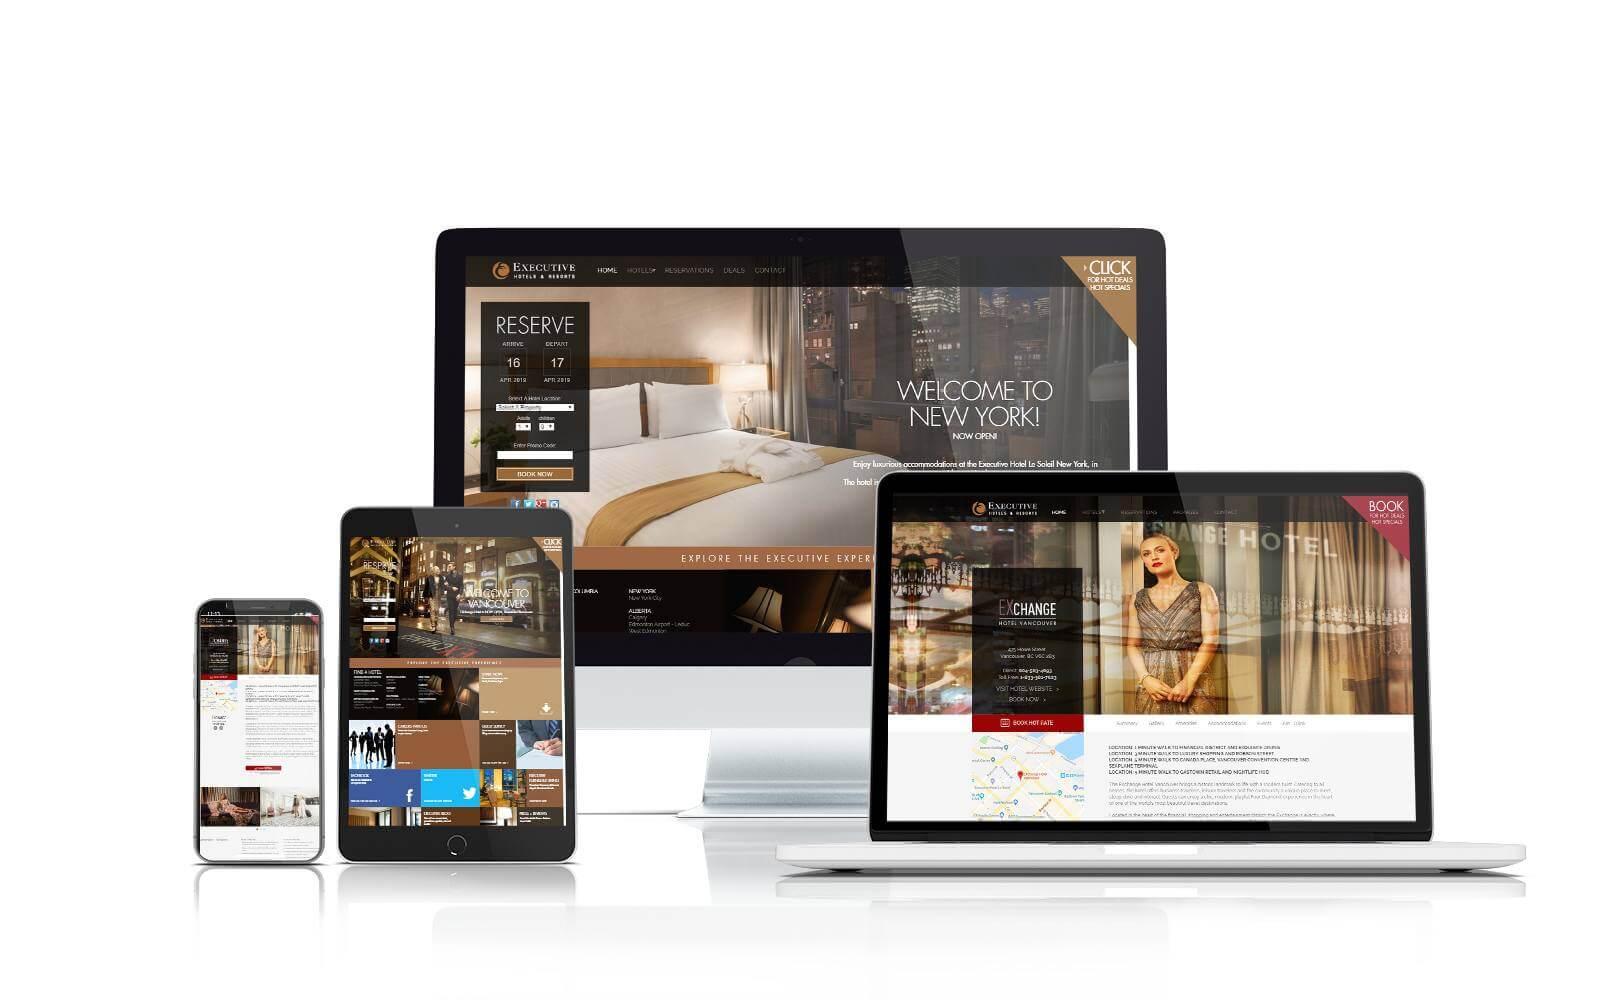 Executive Hotel website